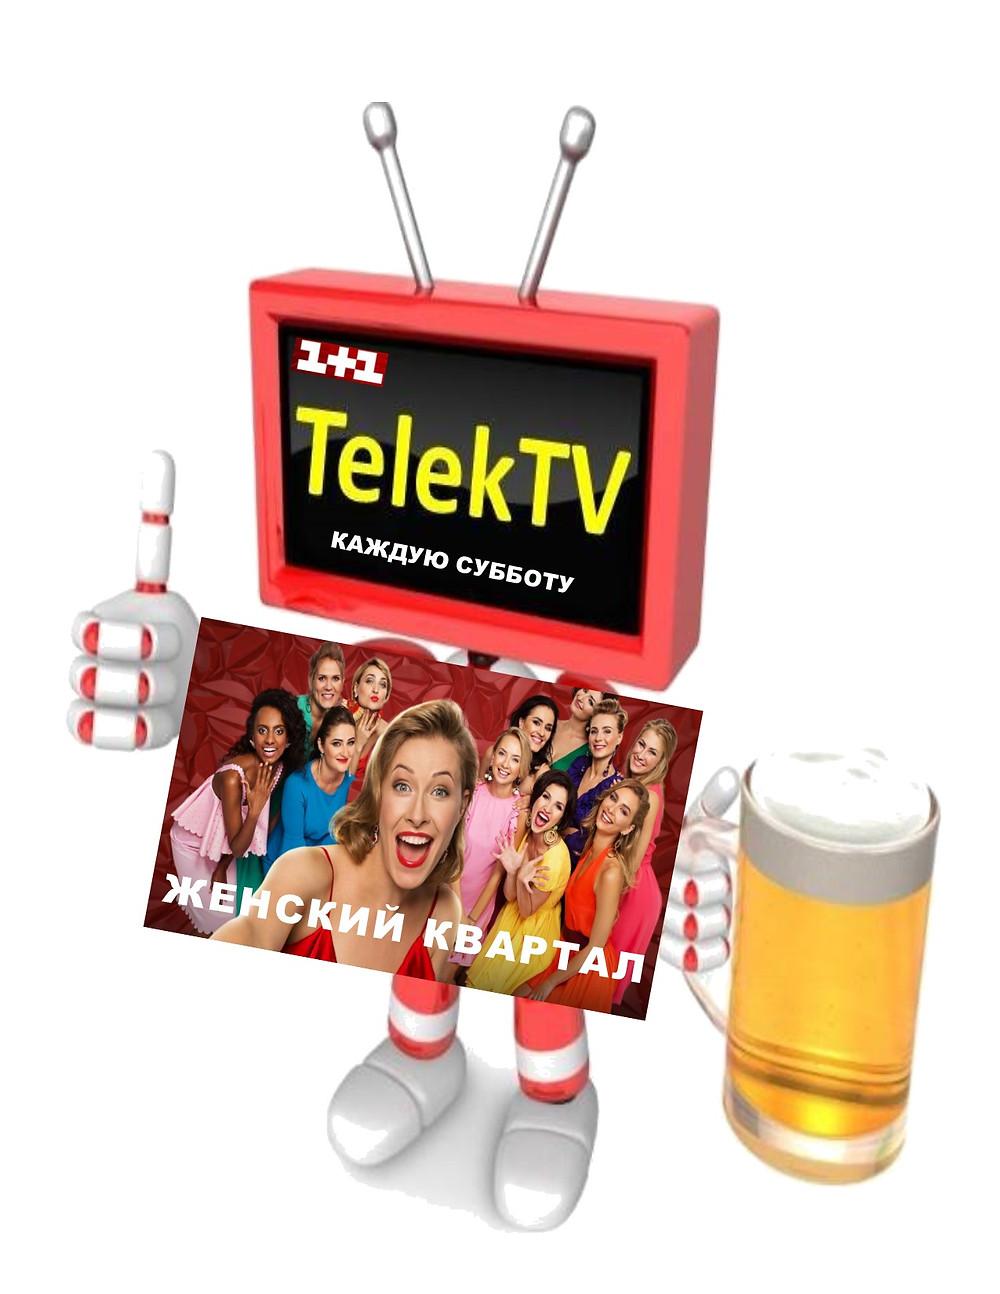 Смотрите Женский Квартал на канале 1+1 у нас на TelekTV